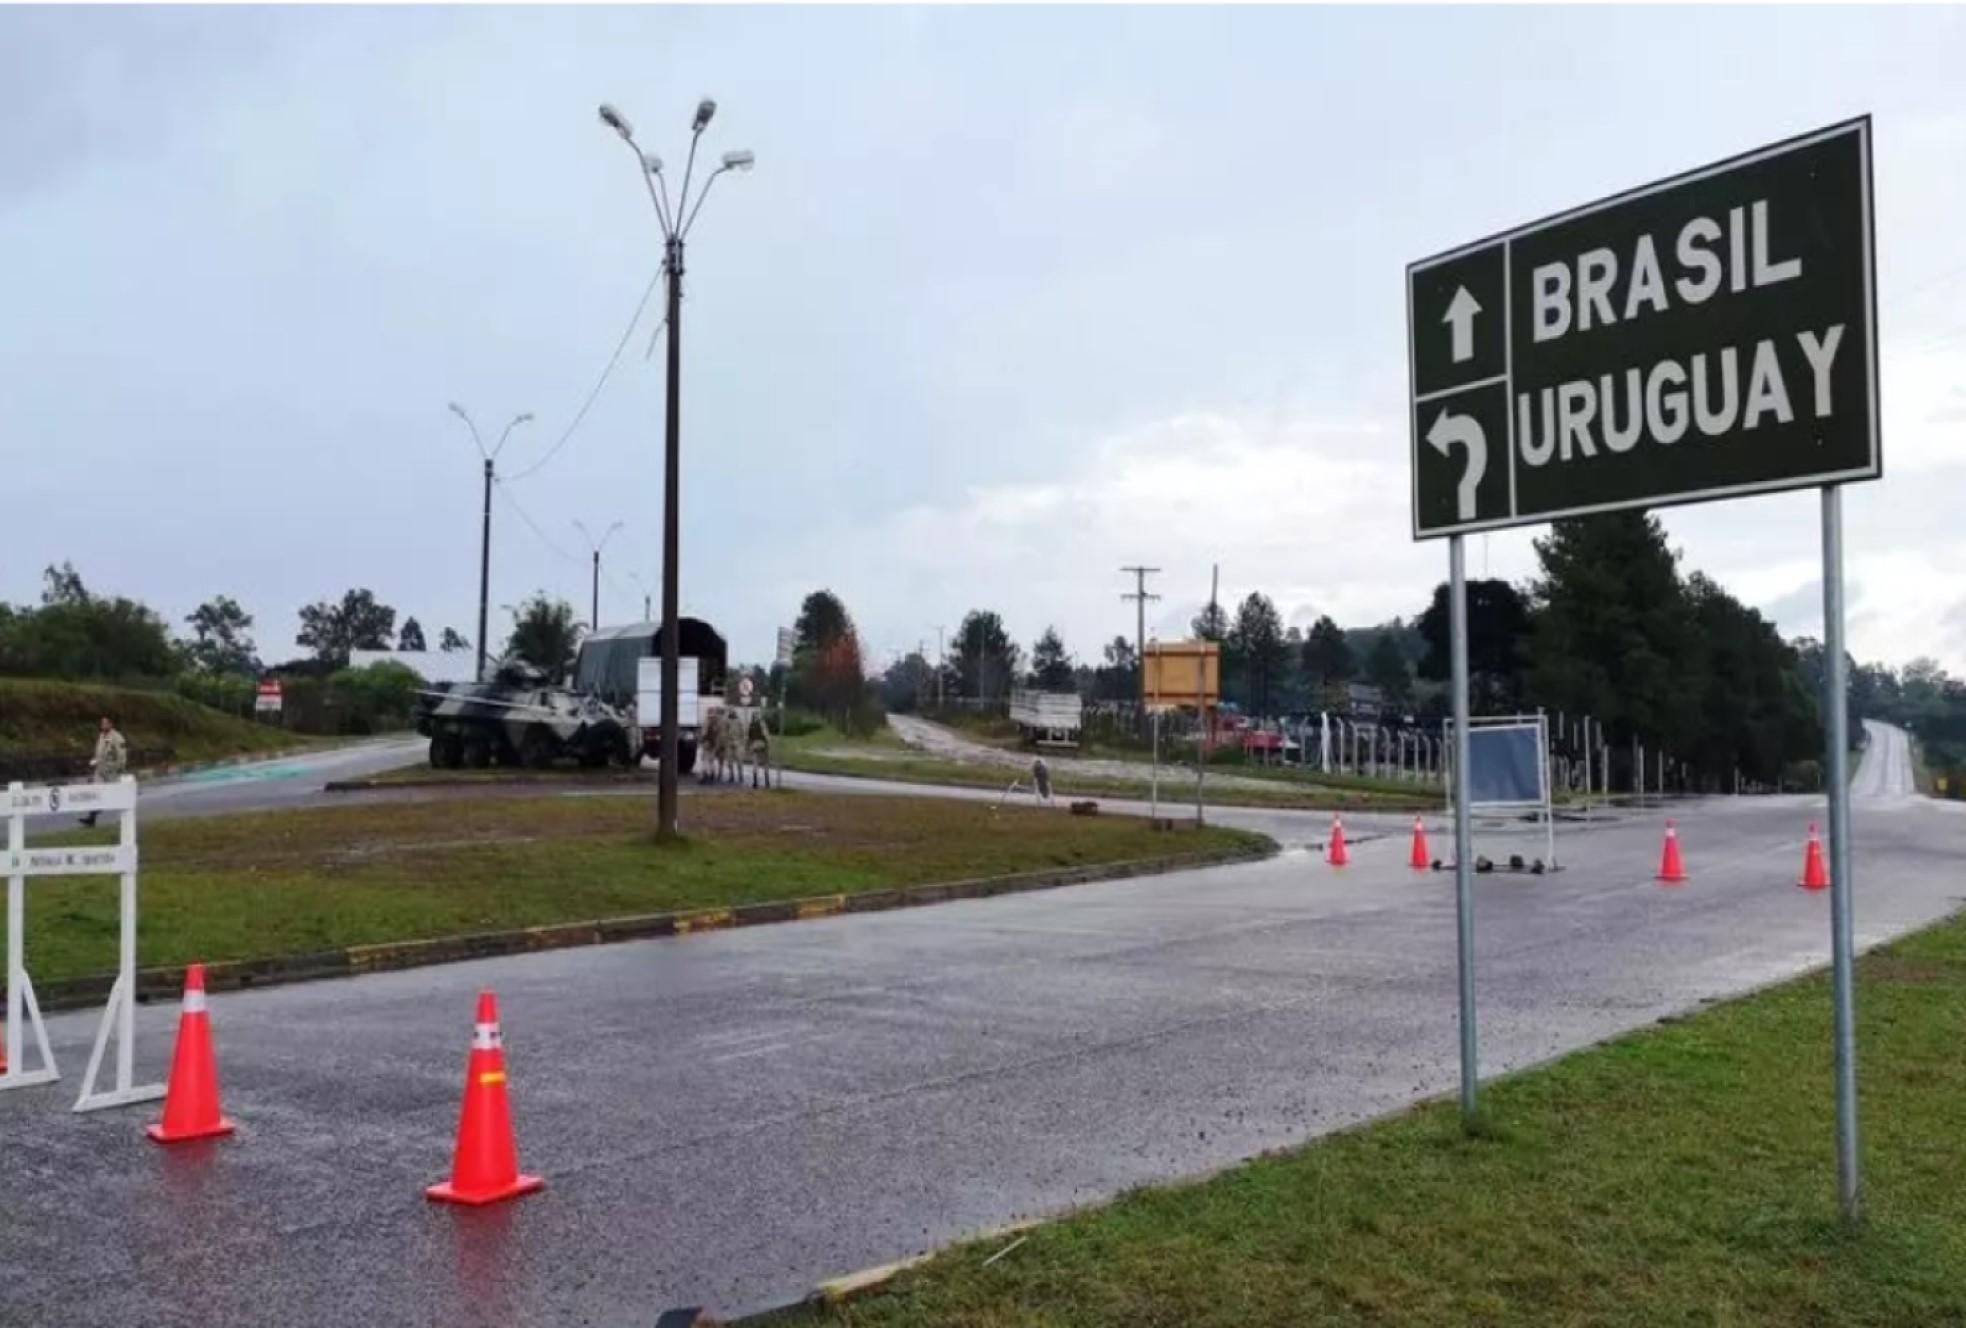 frontera Brasil uruguay